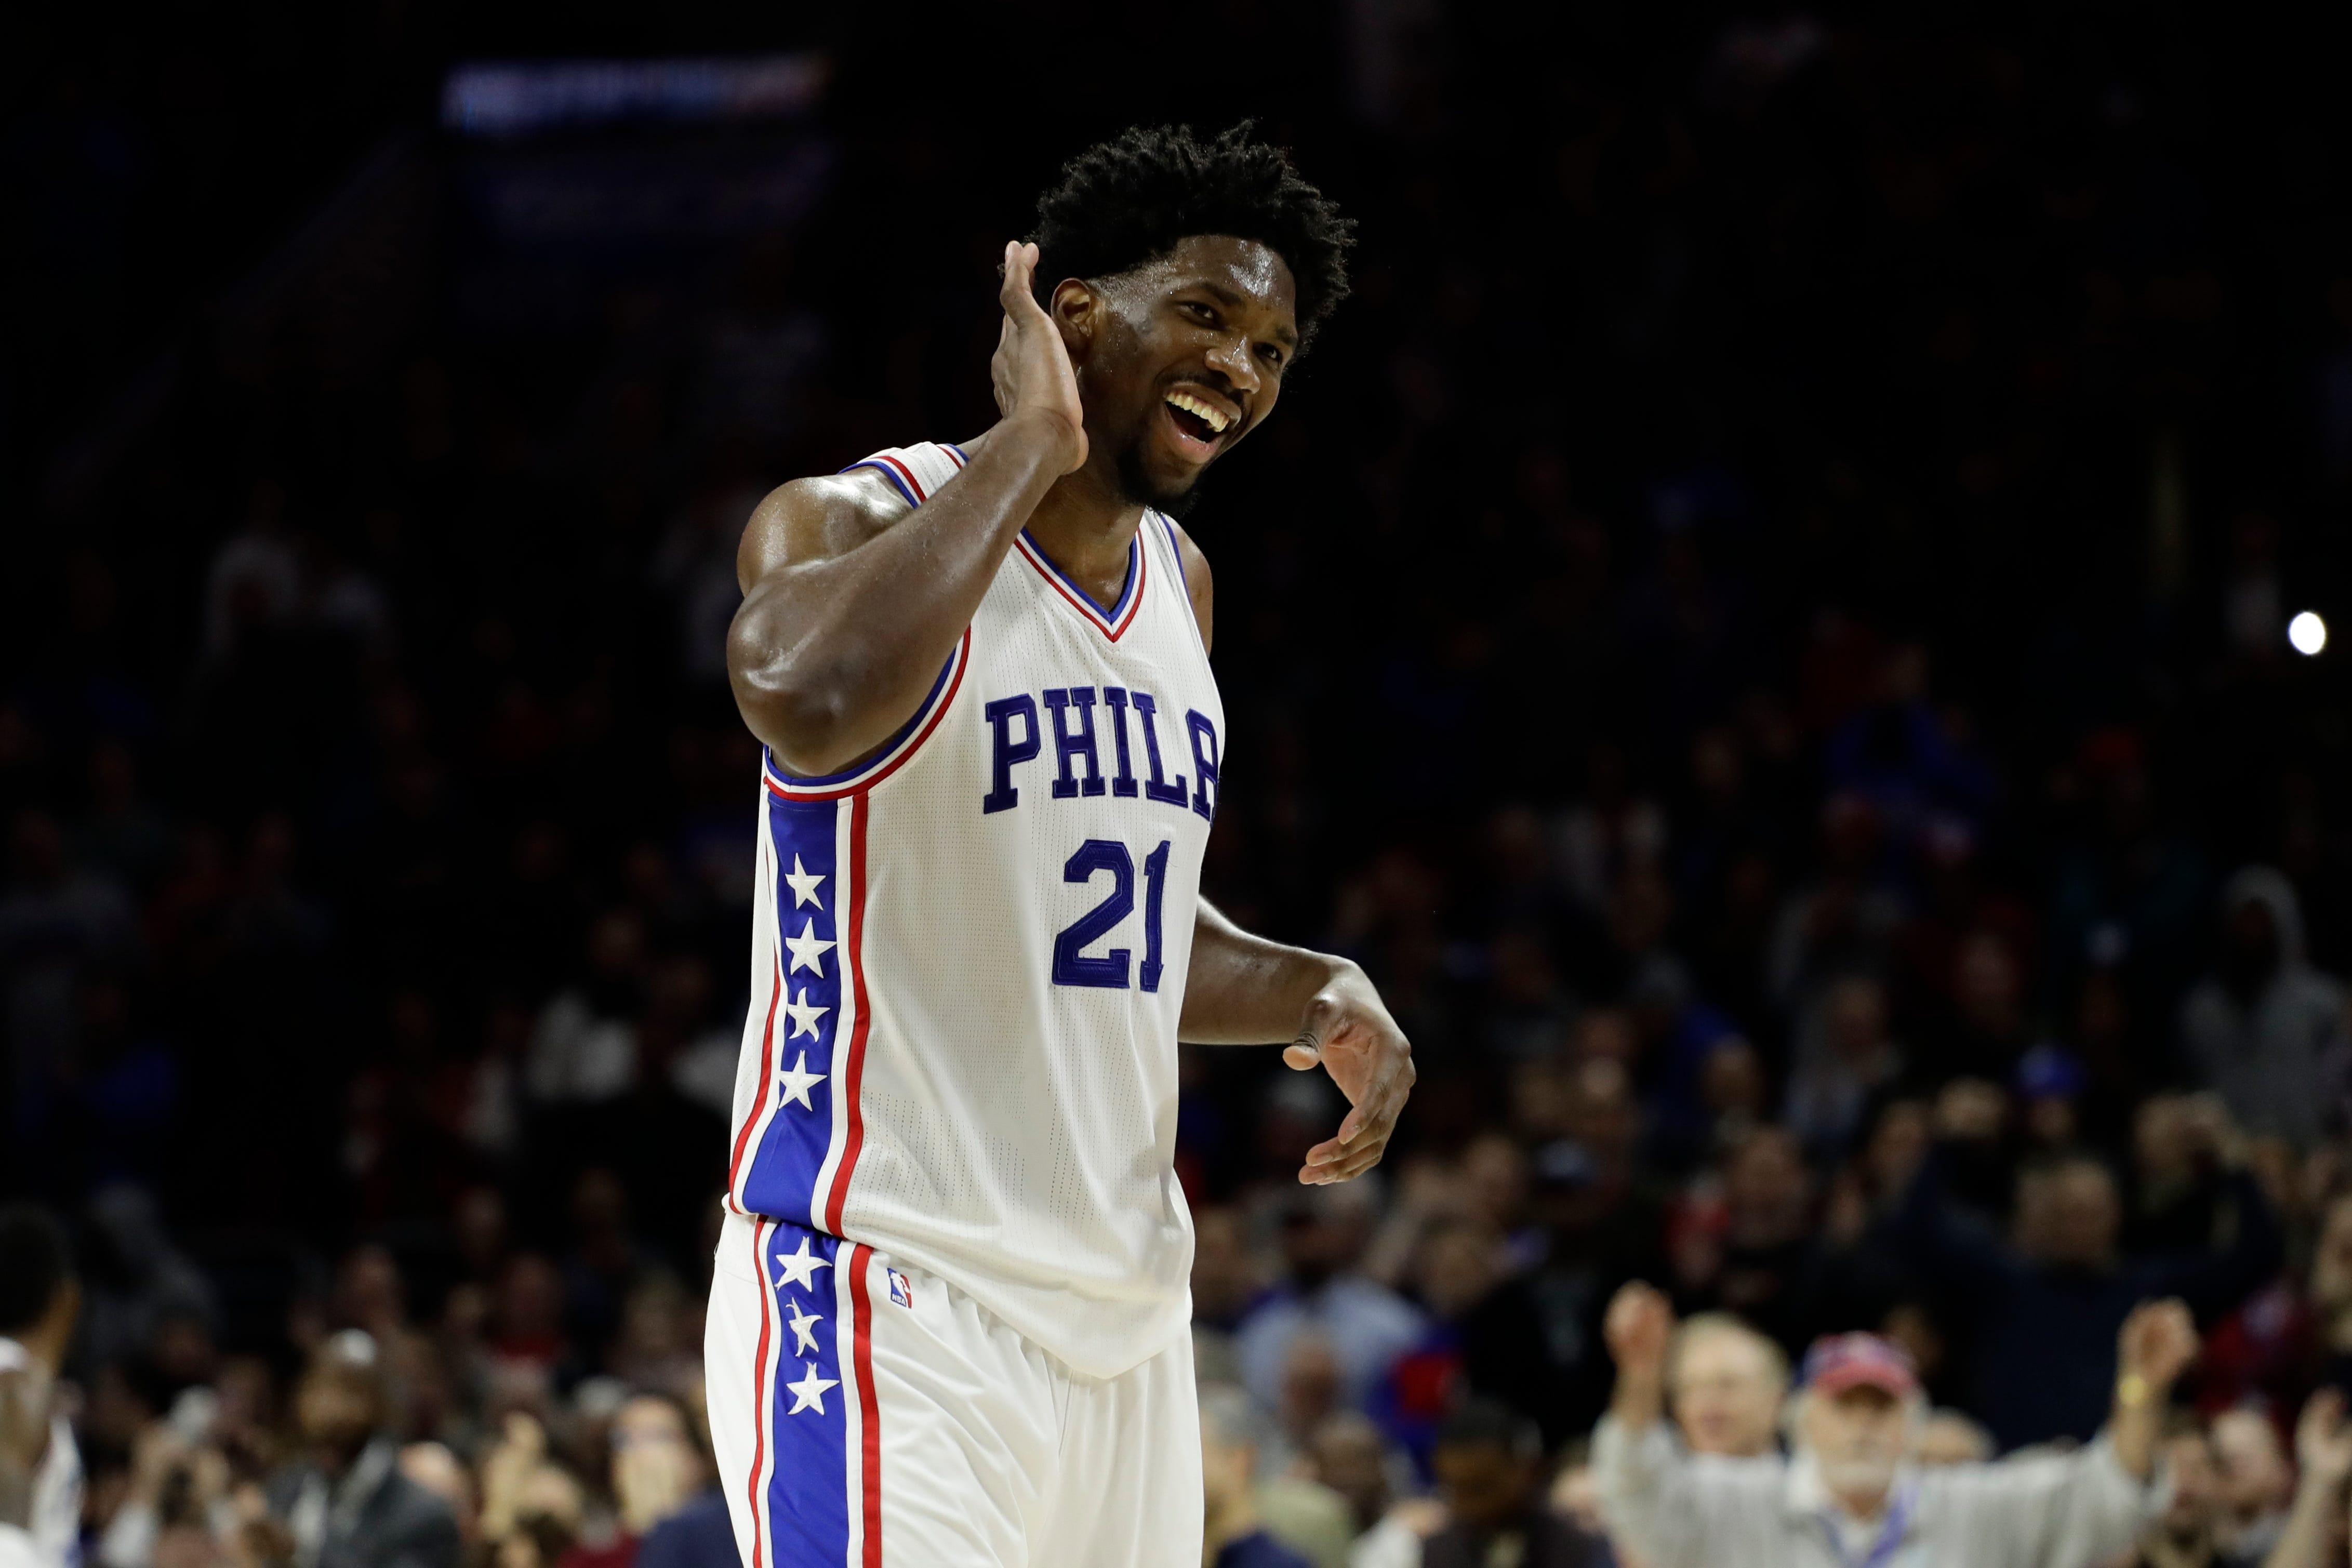 76ers' Joel Embiid, Spurs' Kawhi Leonard named NBA players of the week